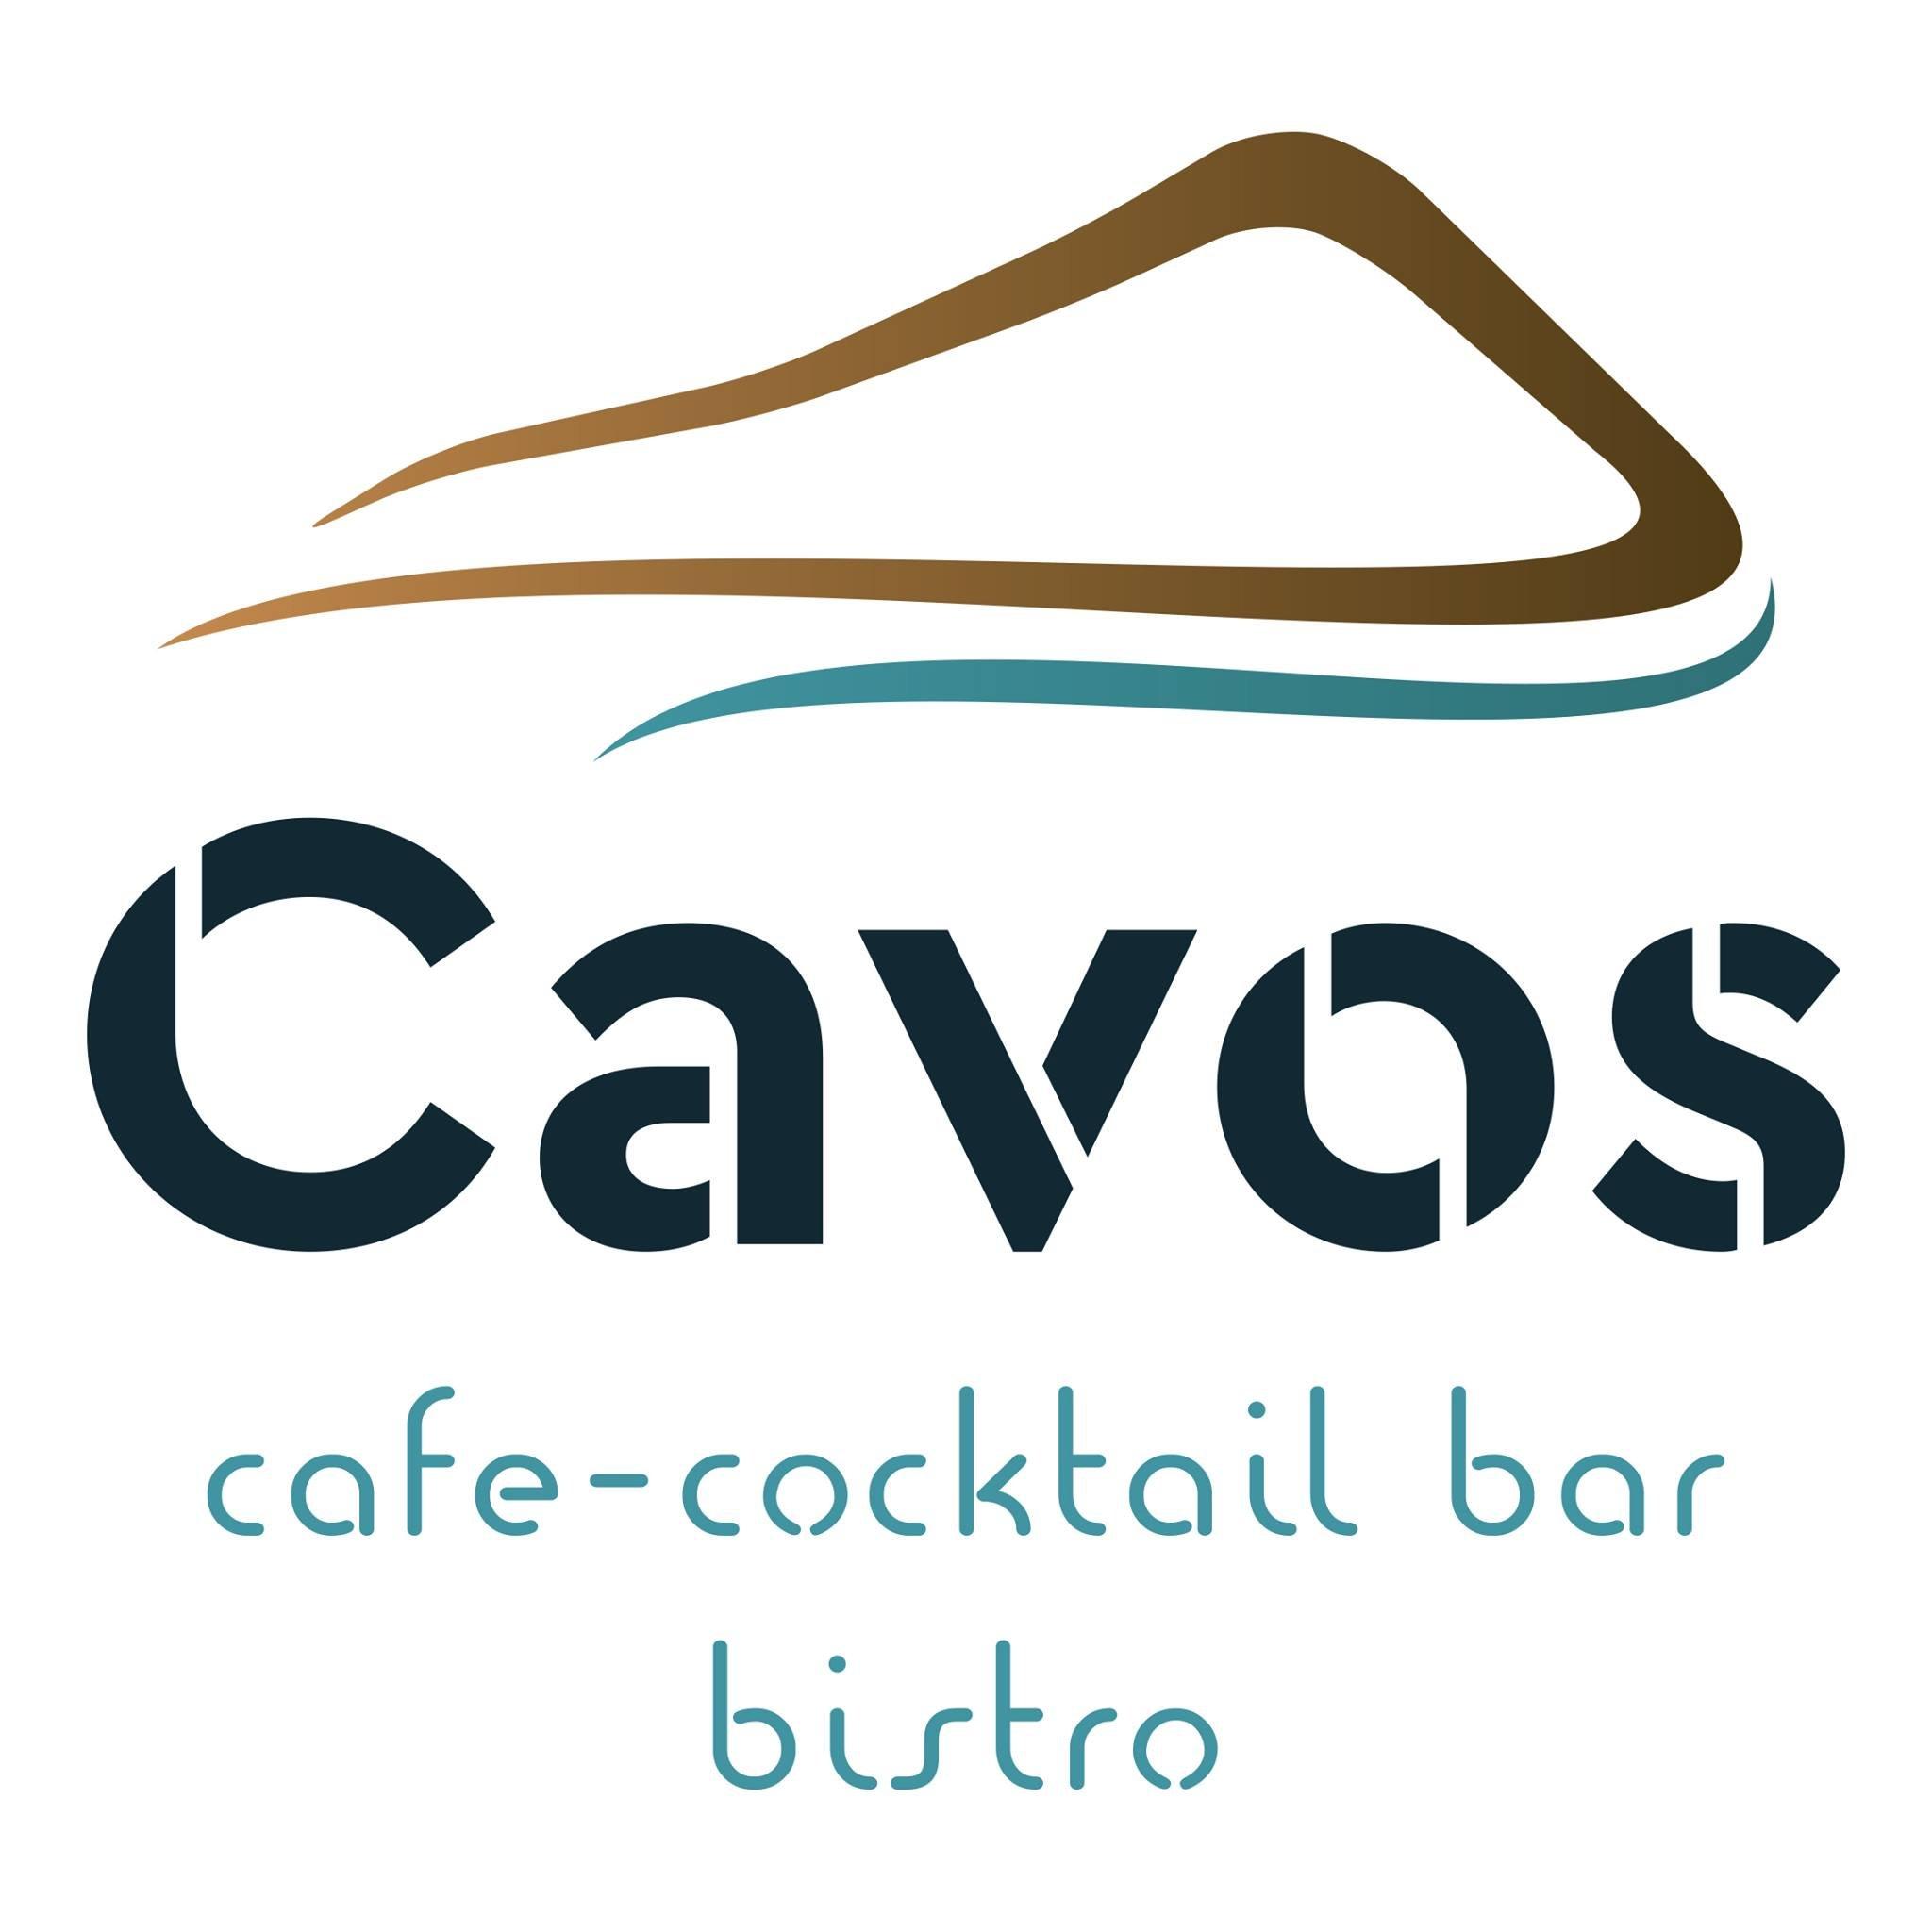 Cavos Cafe Bar